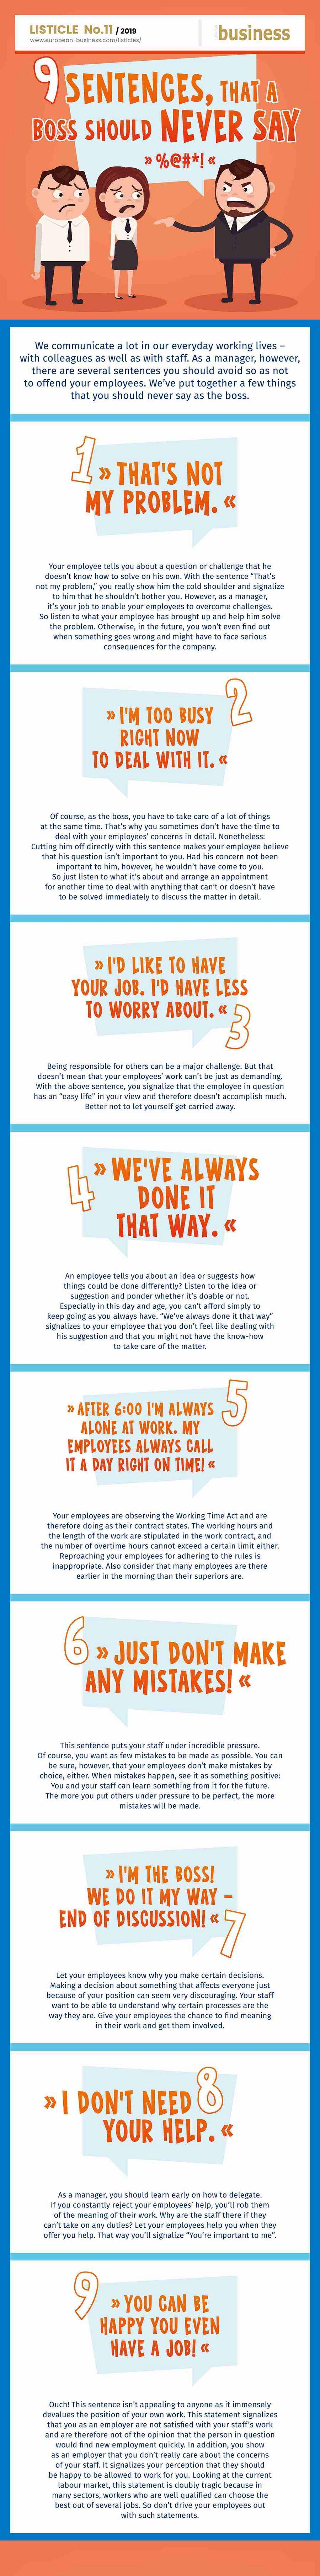 9 sentences that a boss should never say | european-business.com